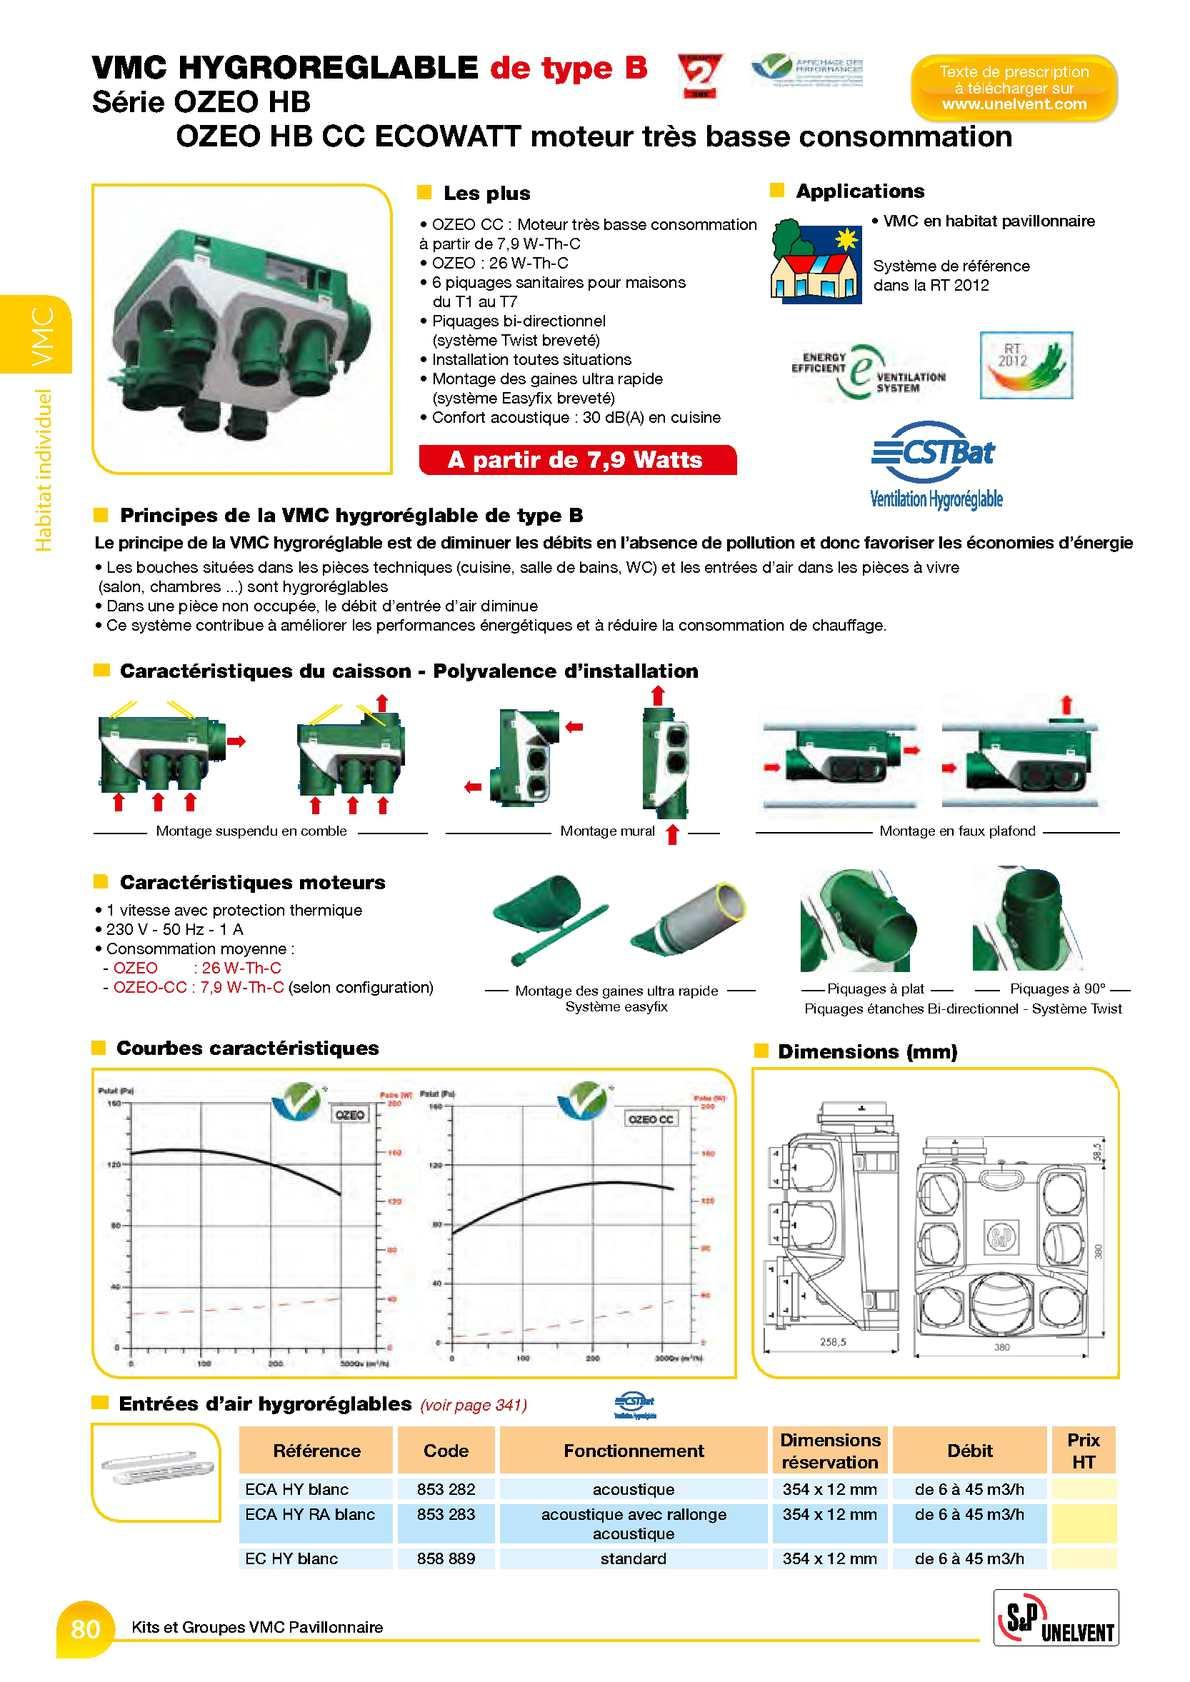 calam o catalogue 2013 vmc hygro b s rie ozeo hb. Black Bedroom Furniture Sets. Home Design Ideas